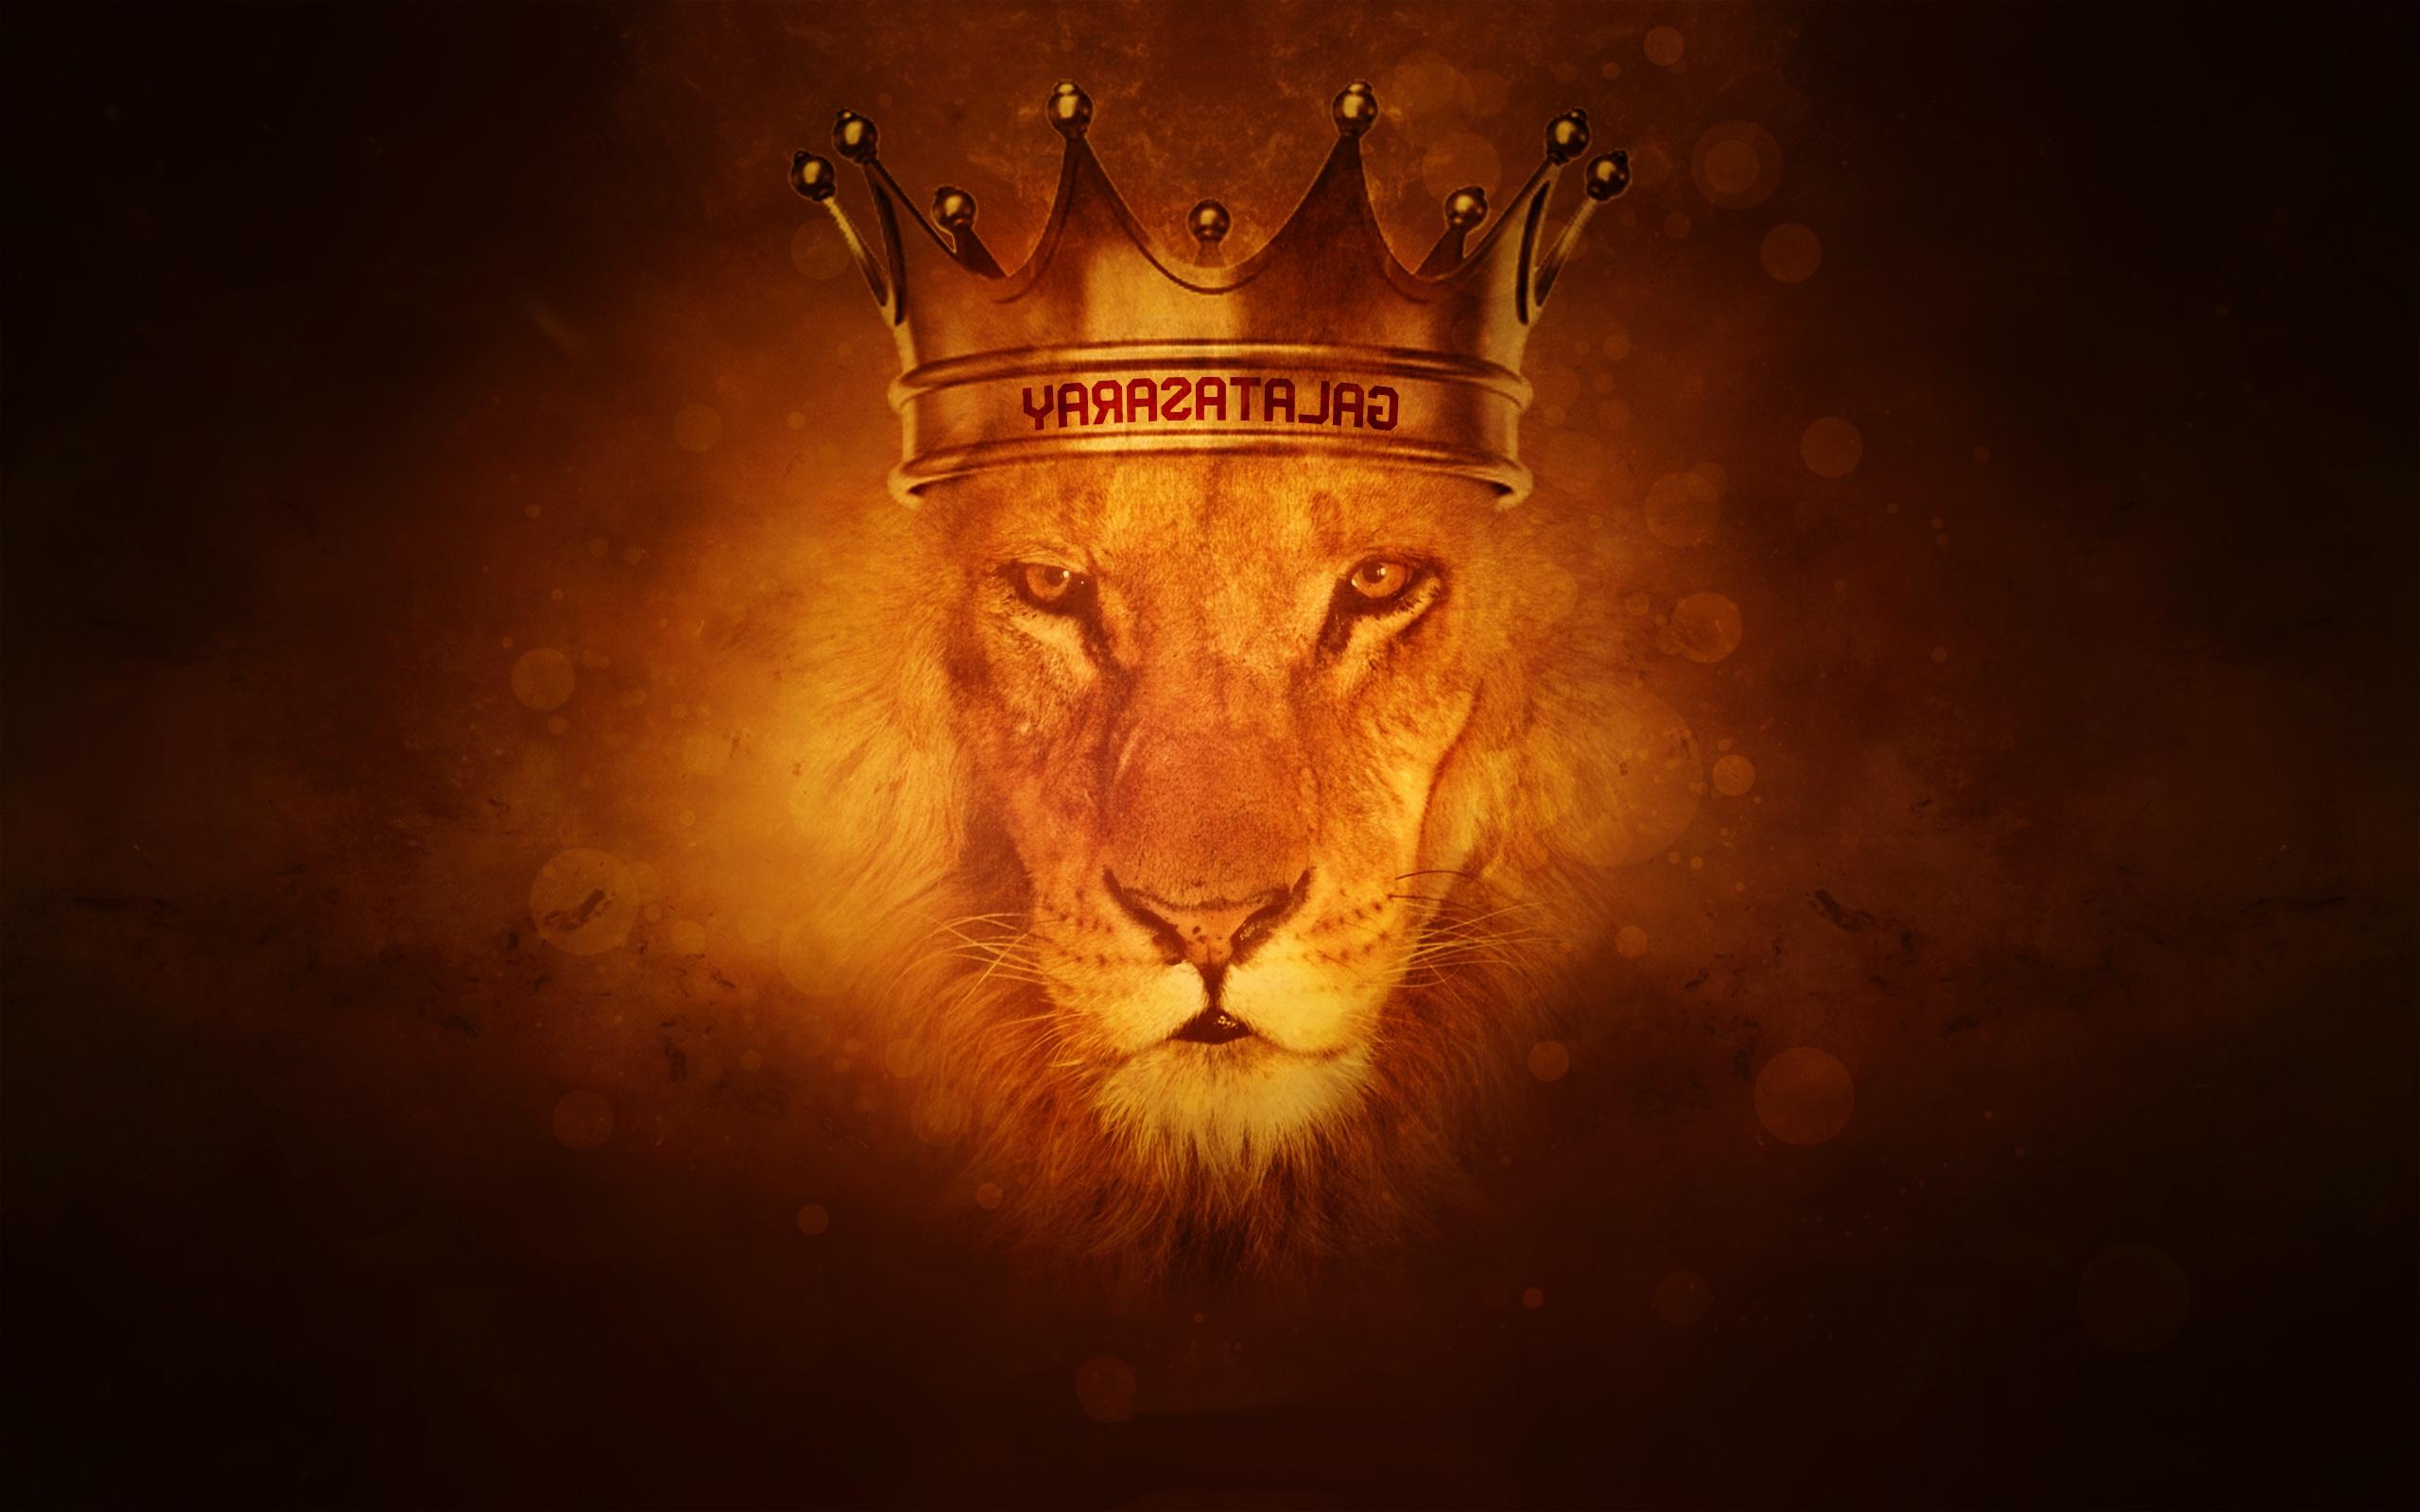 Beautiful Aslan Narnia Background wallpaper23 2560x1600